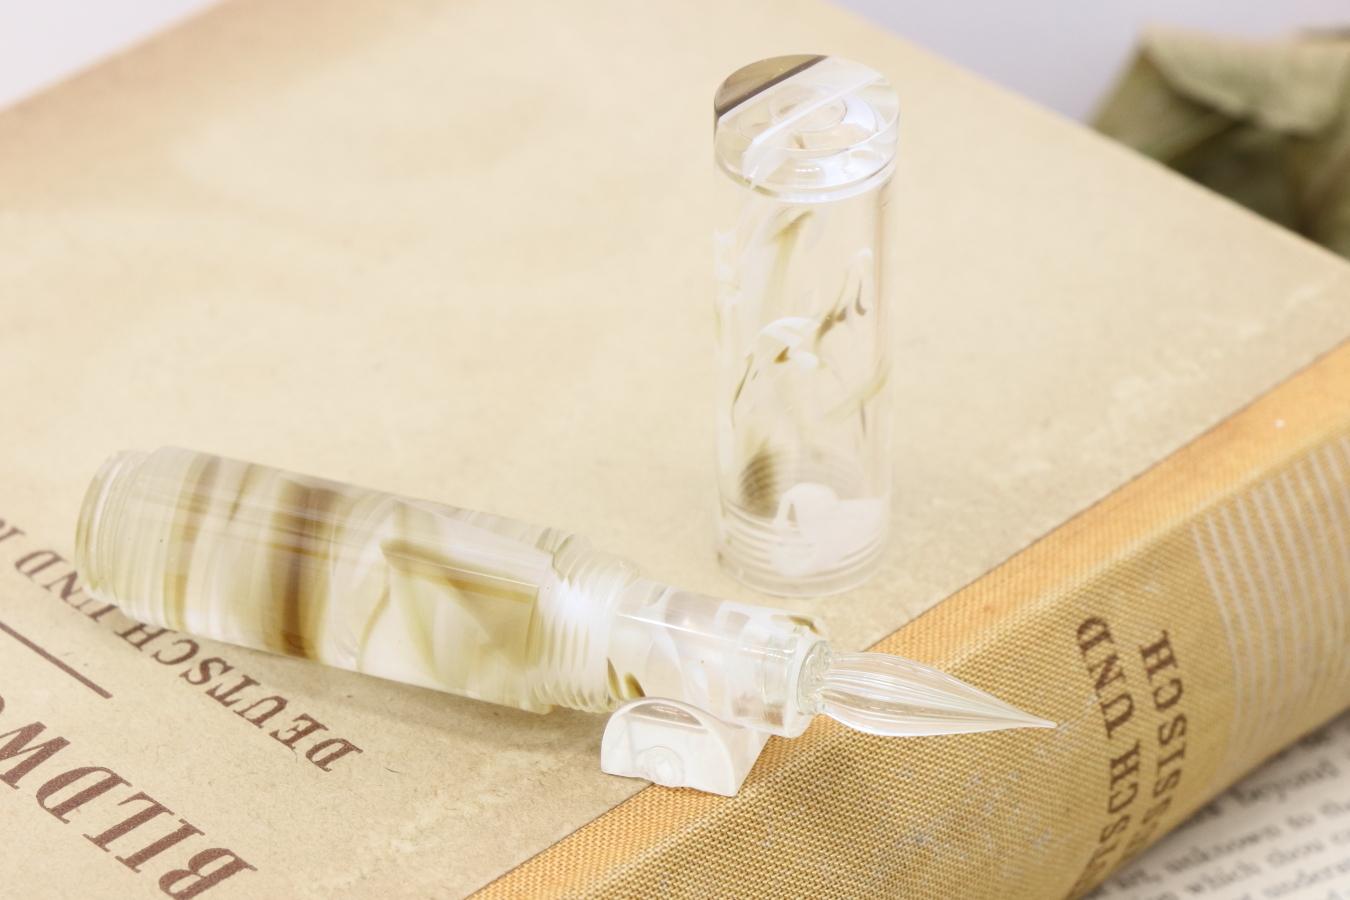 「Lapis mini・アマレットジンジャー」Viriditas手作りキャップ付きガラスペン